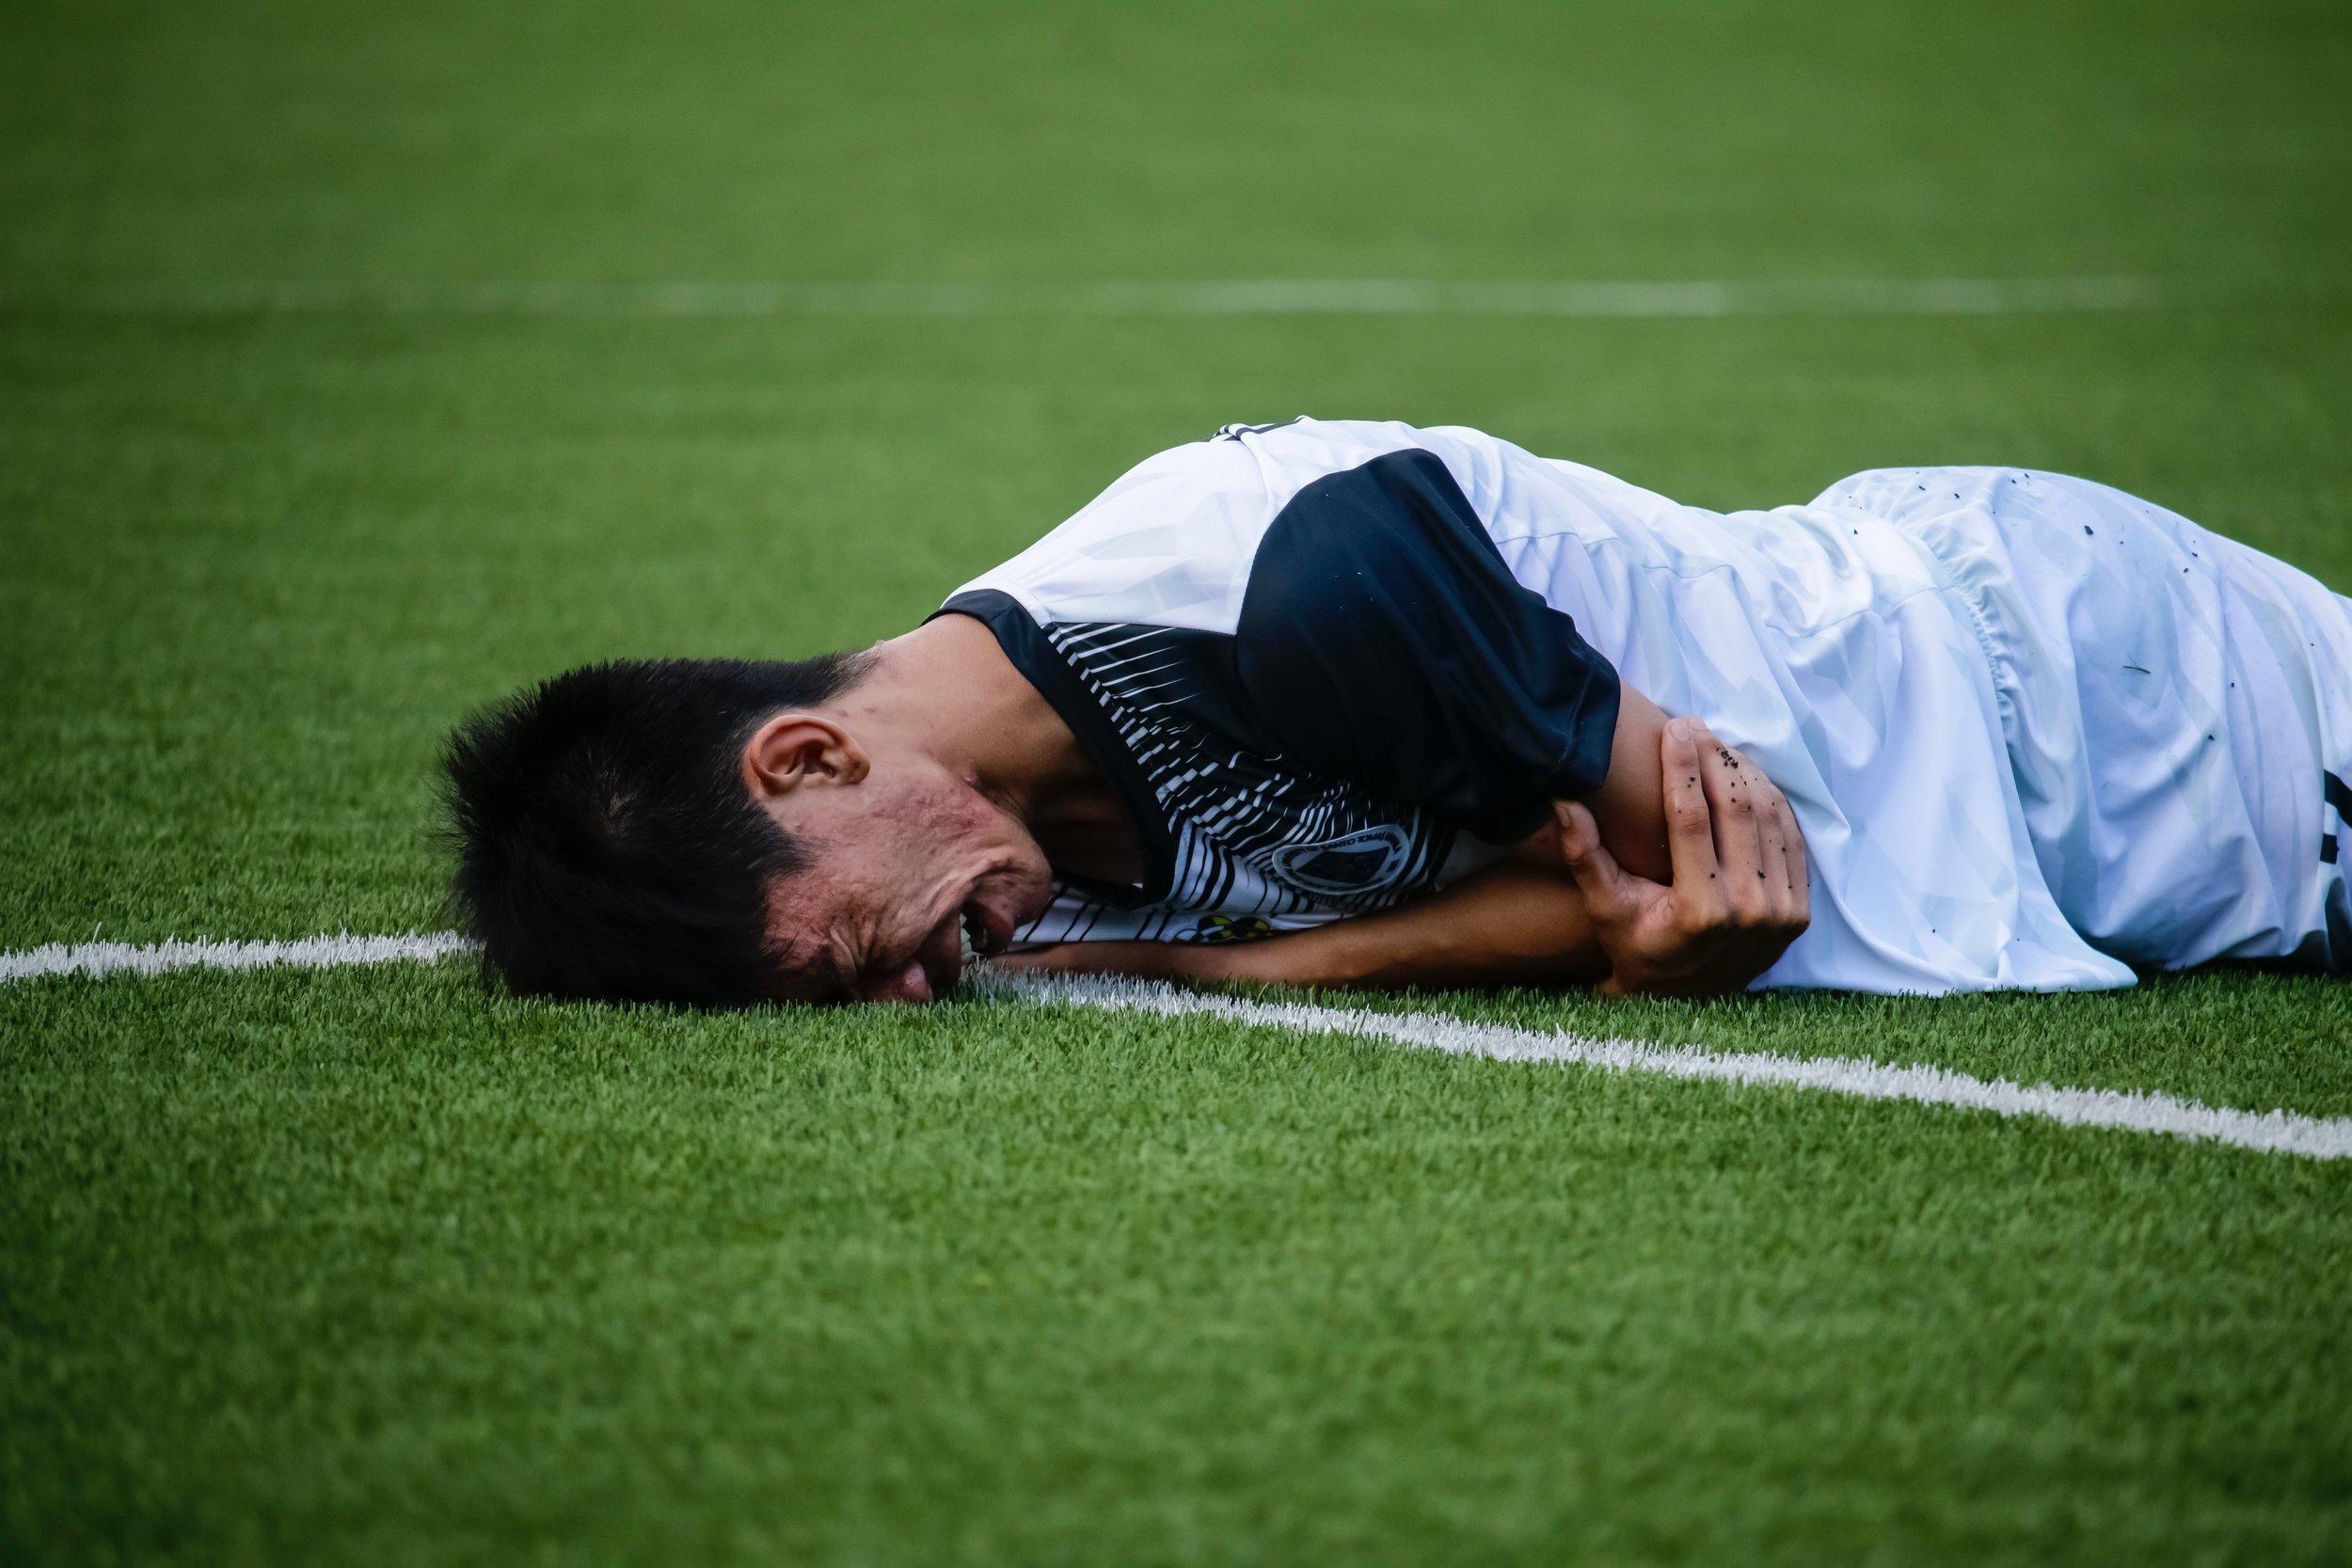 athlete-football-game-1277396.jpg